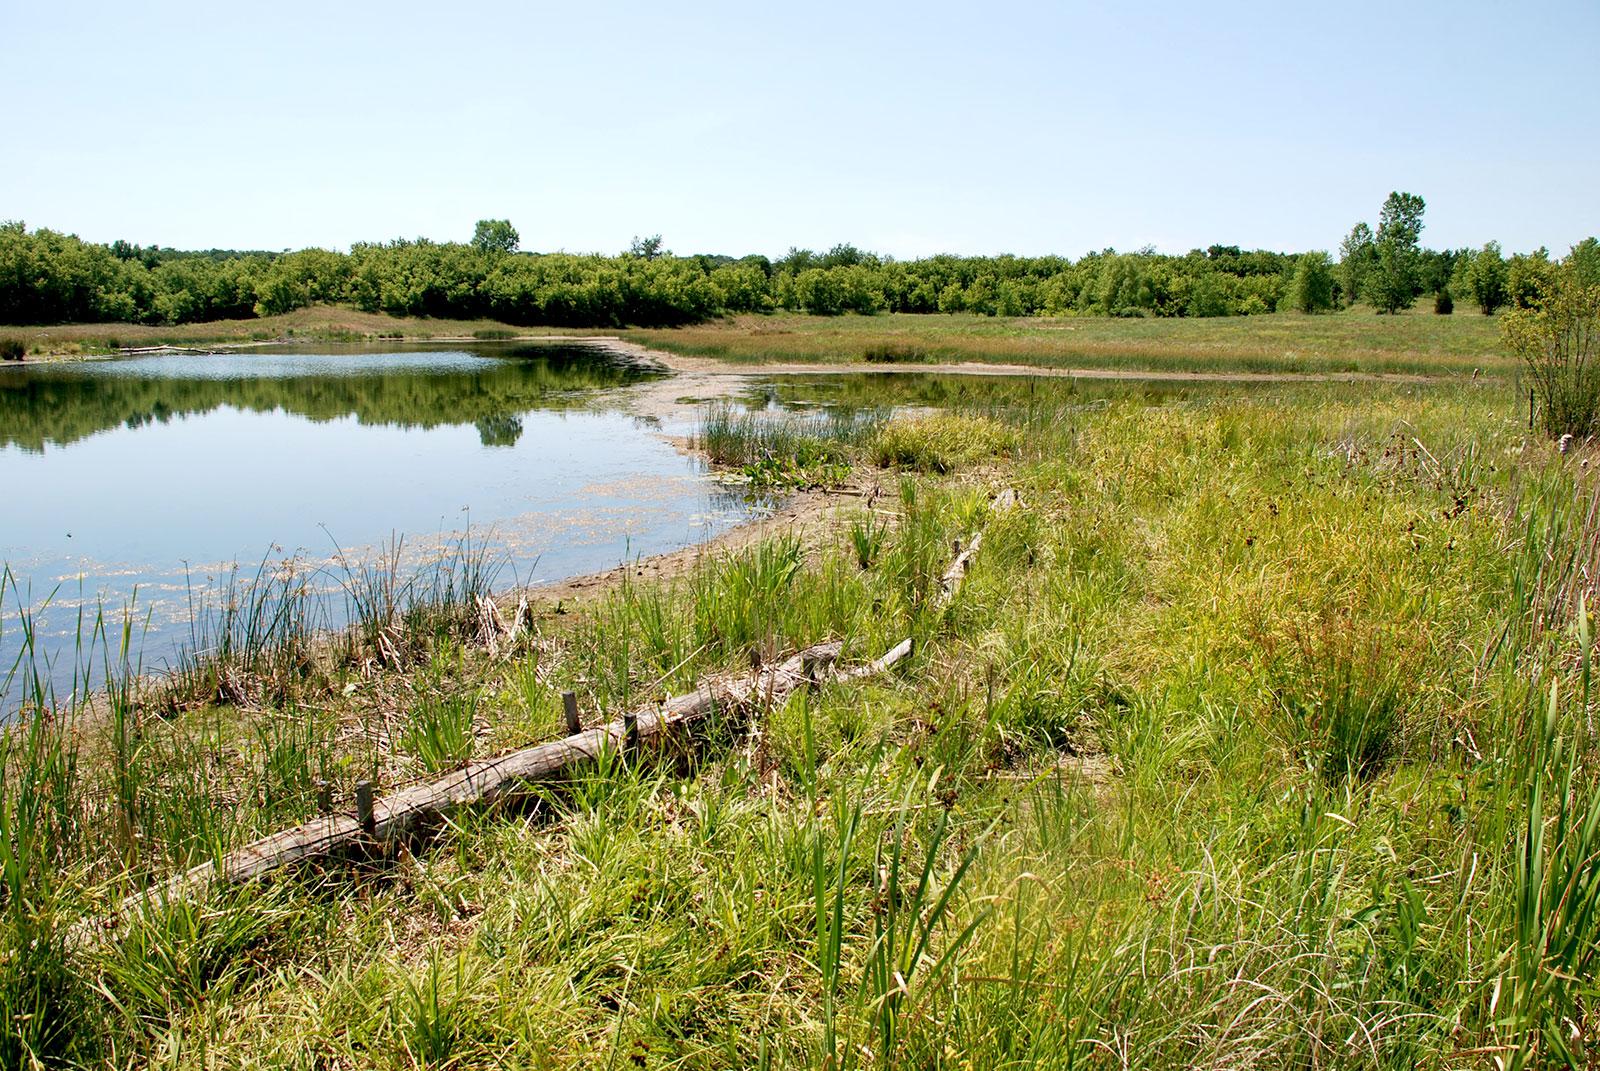 Jelkes Creek Preserve